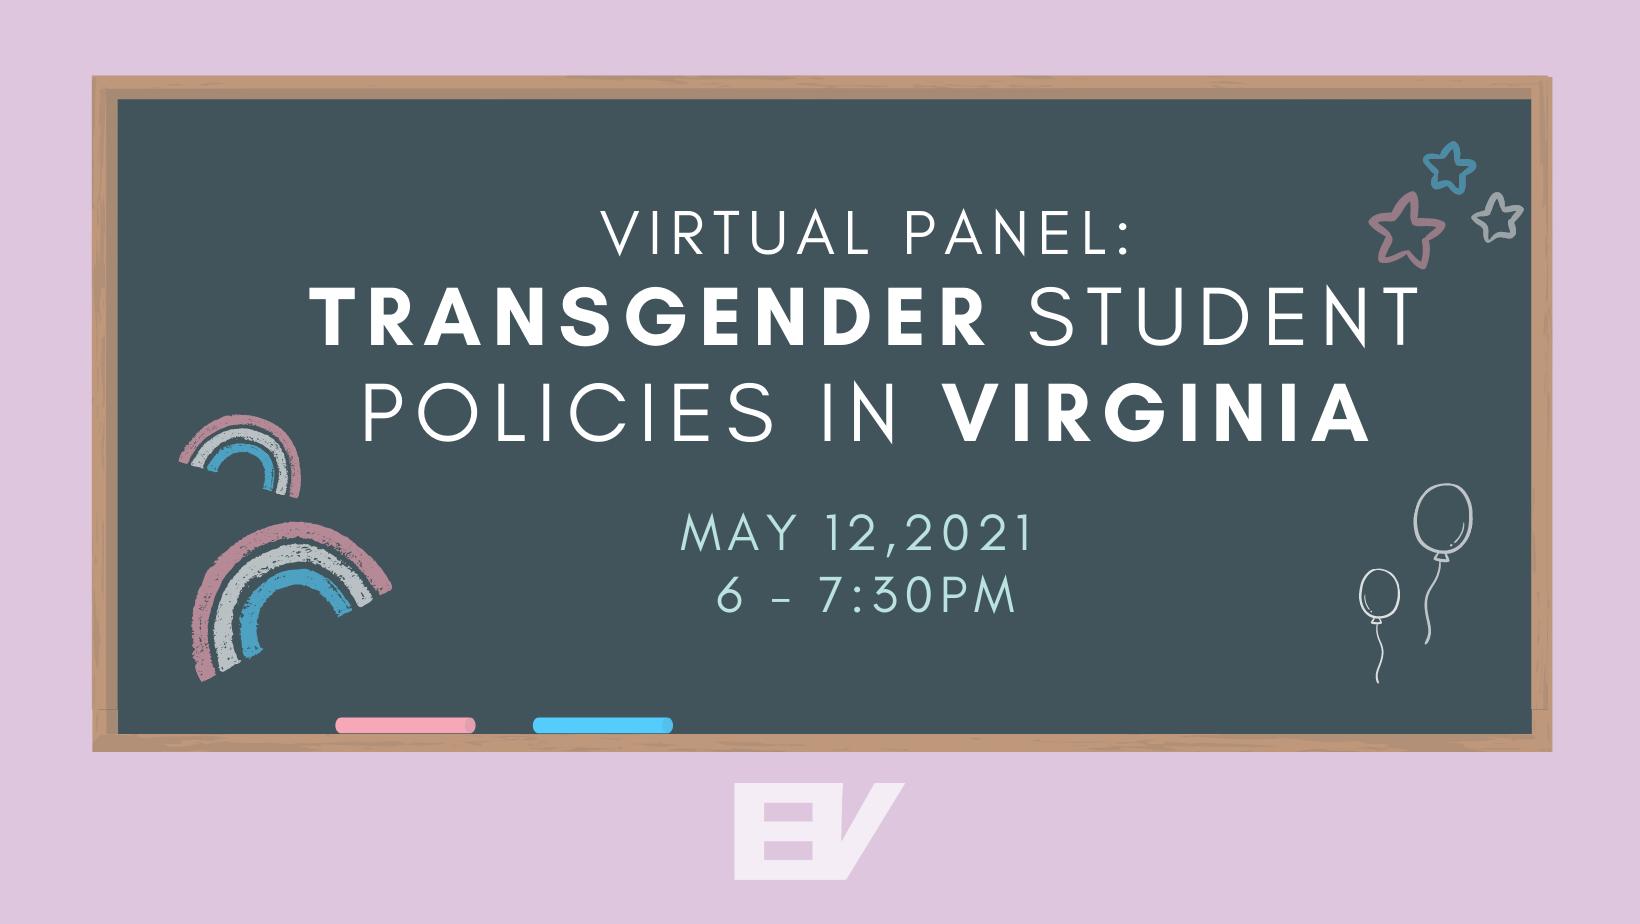 Virtual Panel: Transgender Student Policies in Virginia